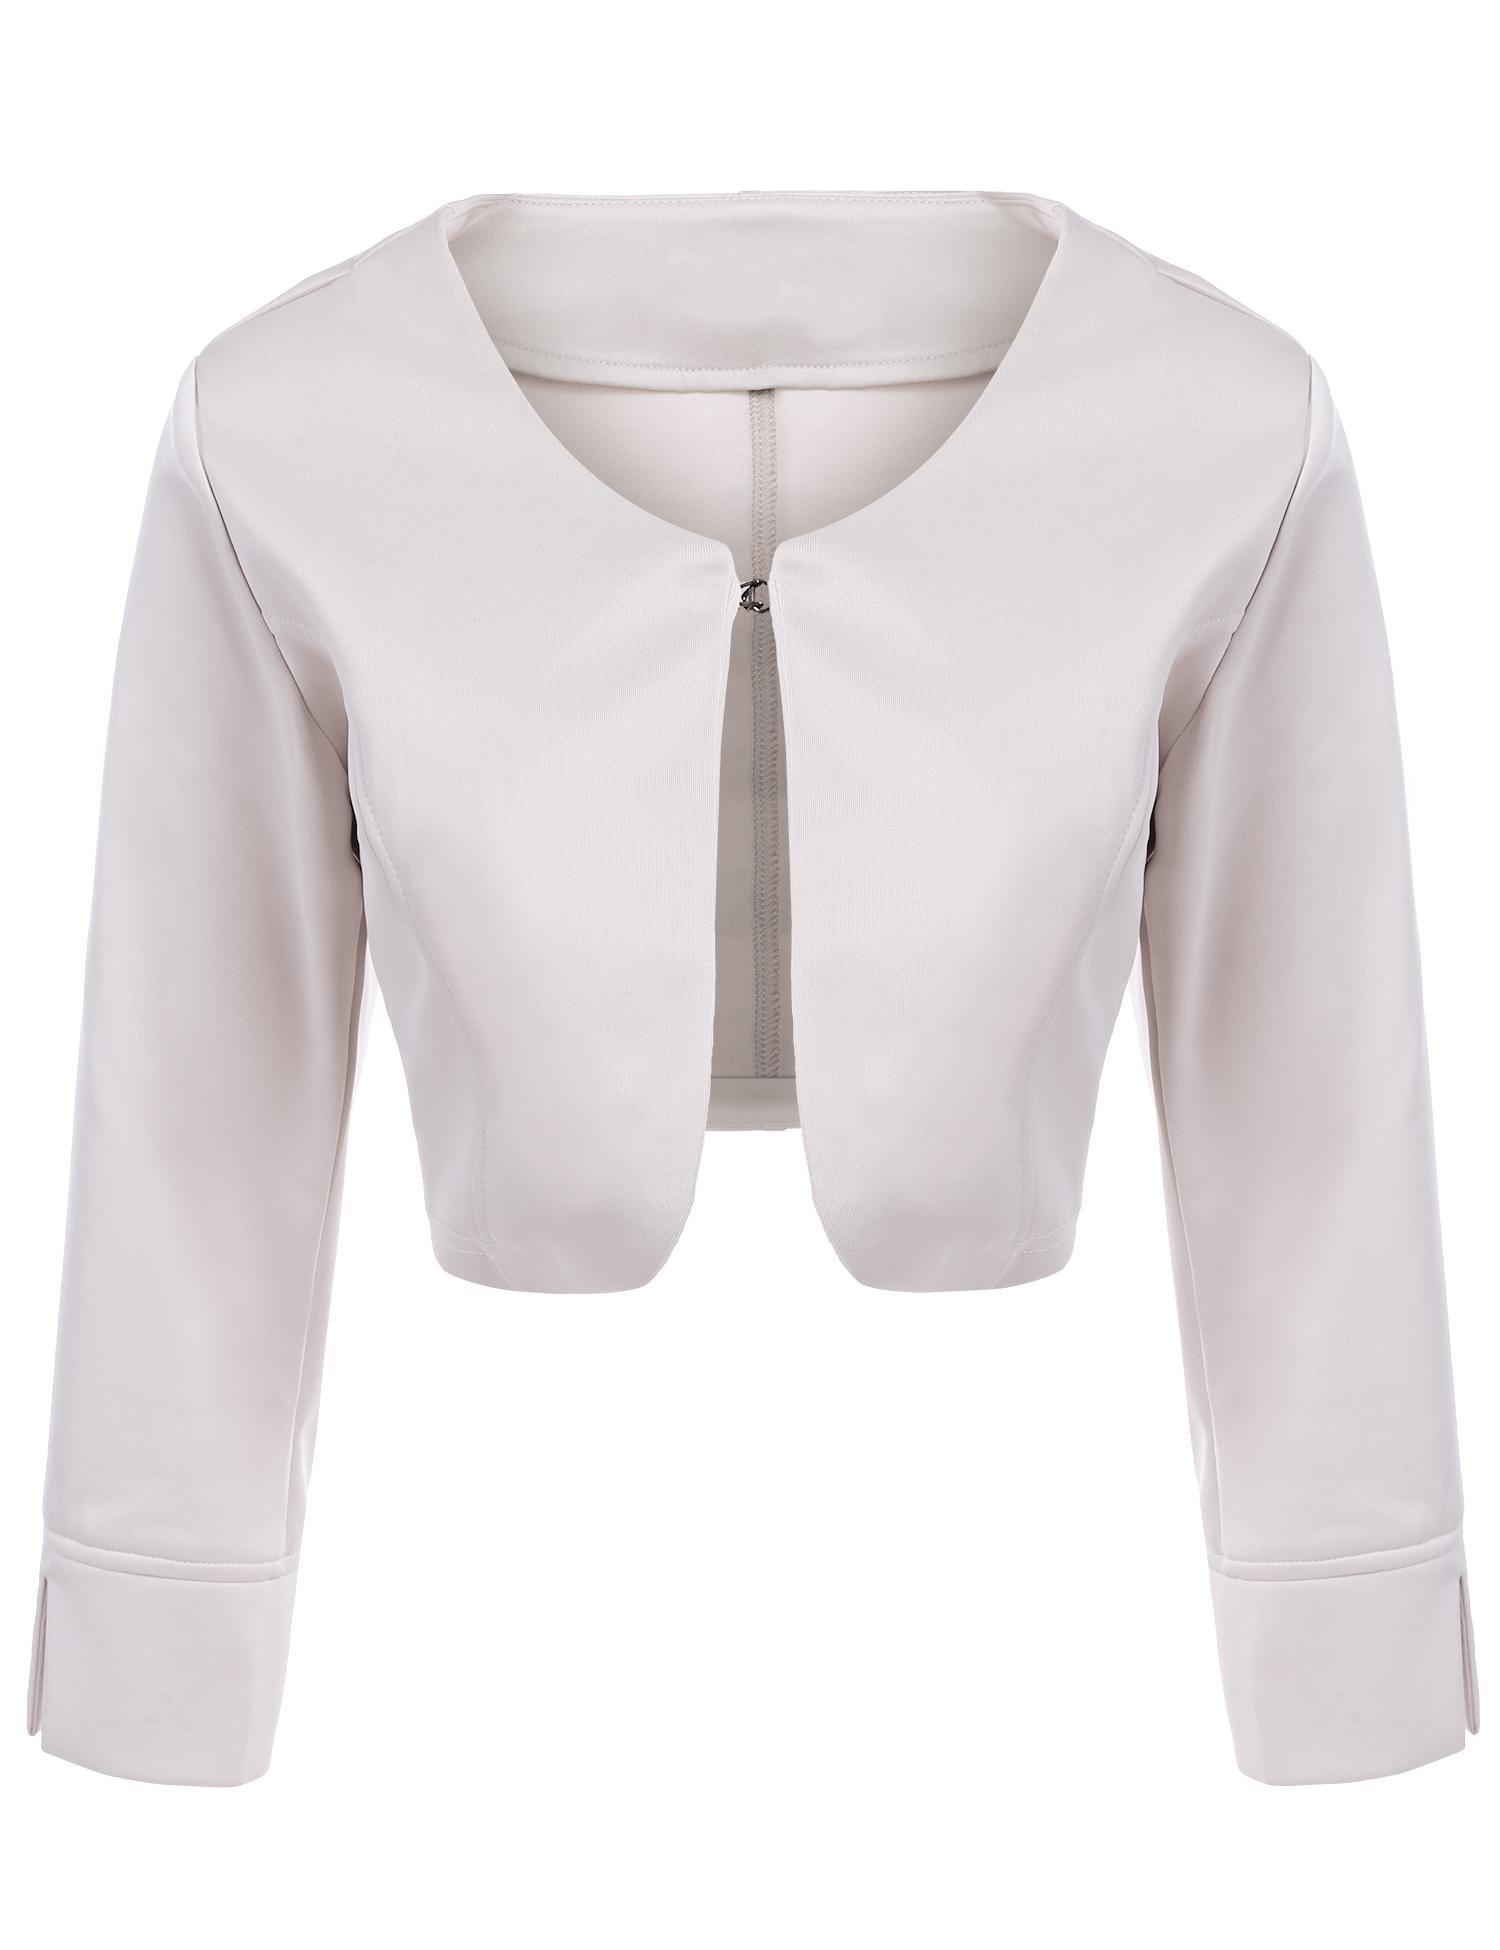 Asatr Women's Long Sleeve Dressy Open Front Bolero Shrug Top Jacket